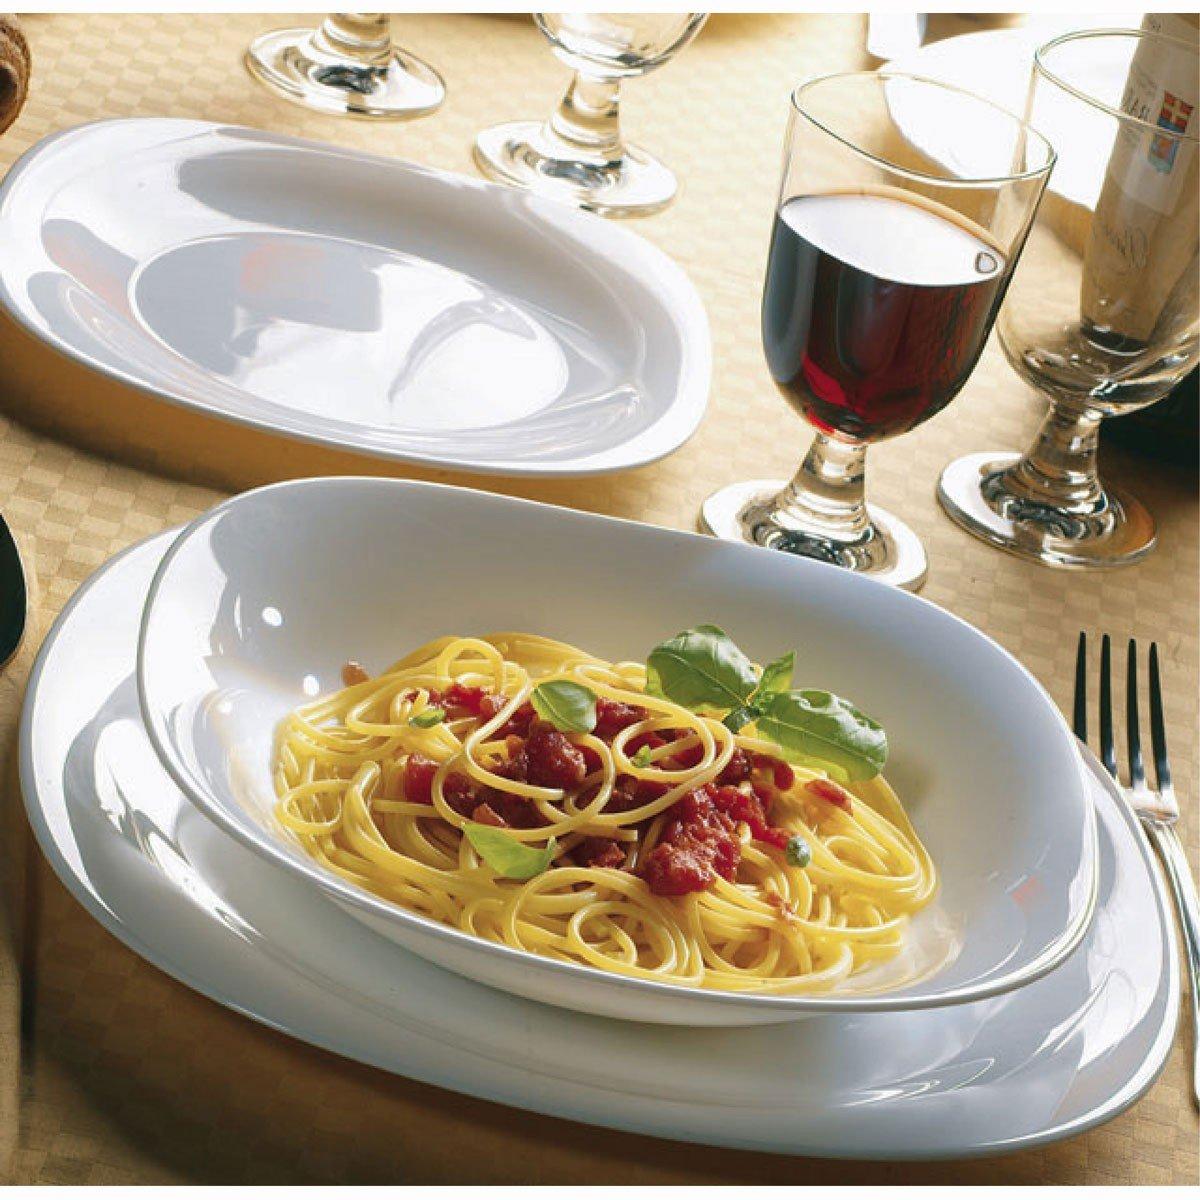 Amazon.com | Bormioli Rocco Parma Dessert Plates Set of 6 White Small Plates Accent Plates & Amazon.com | Bormioli Rocco Parma Dessert Plates Set of 6 White ...